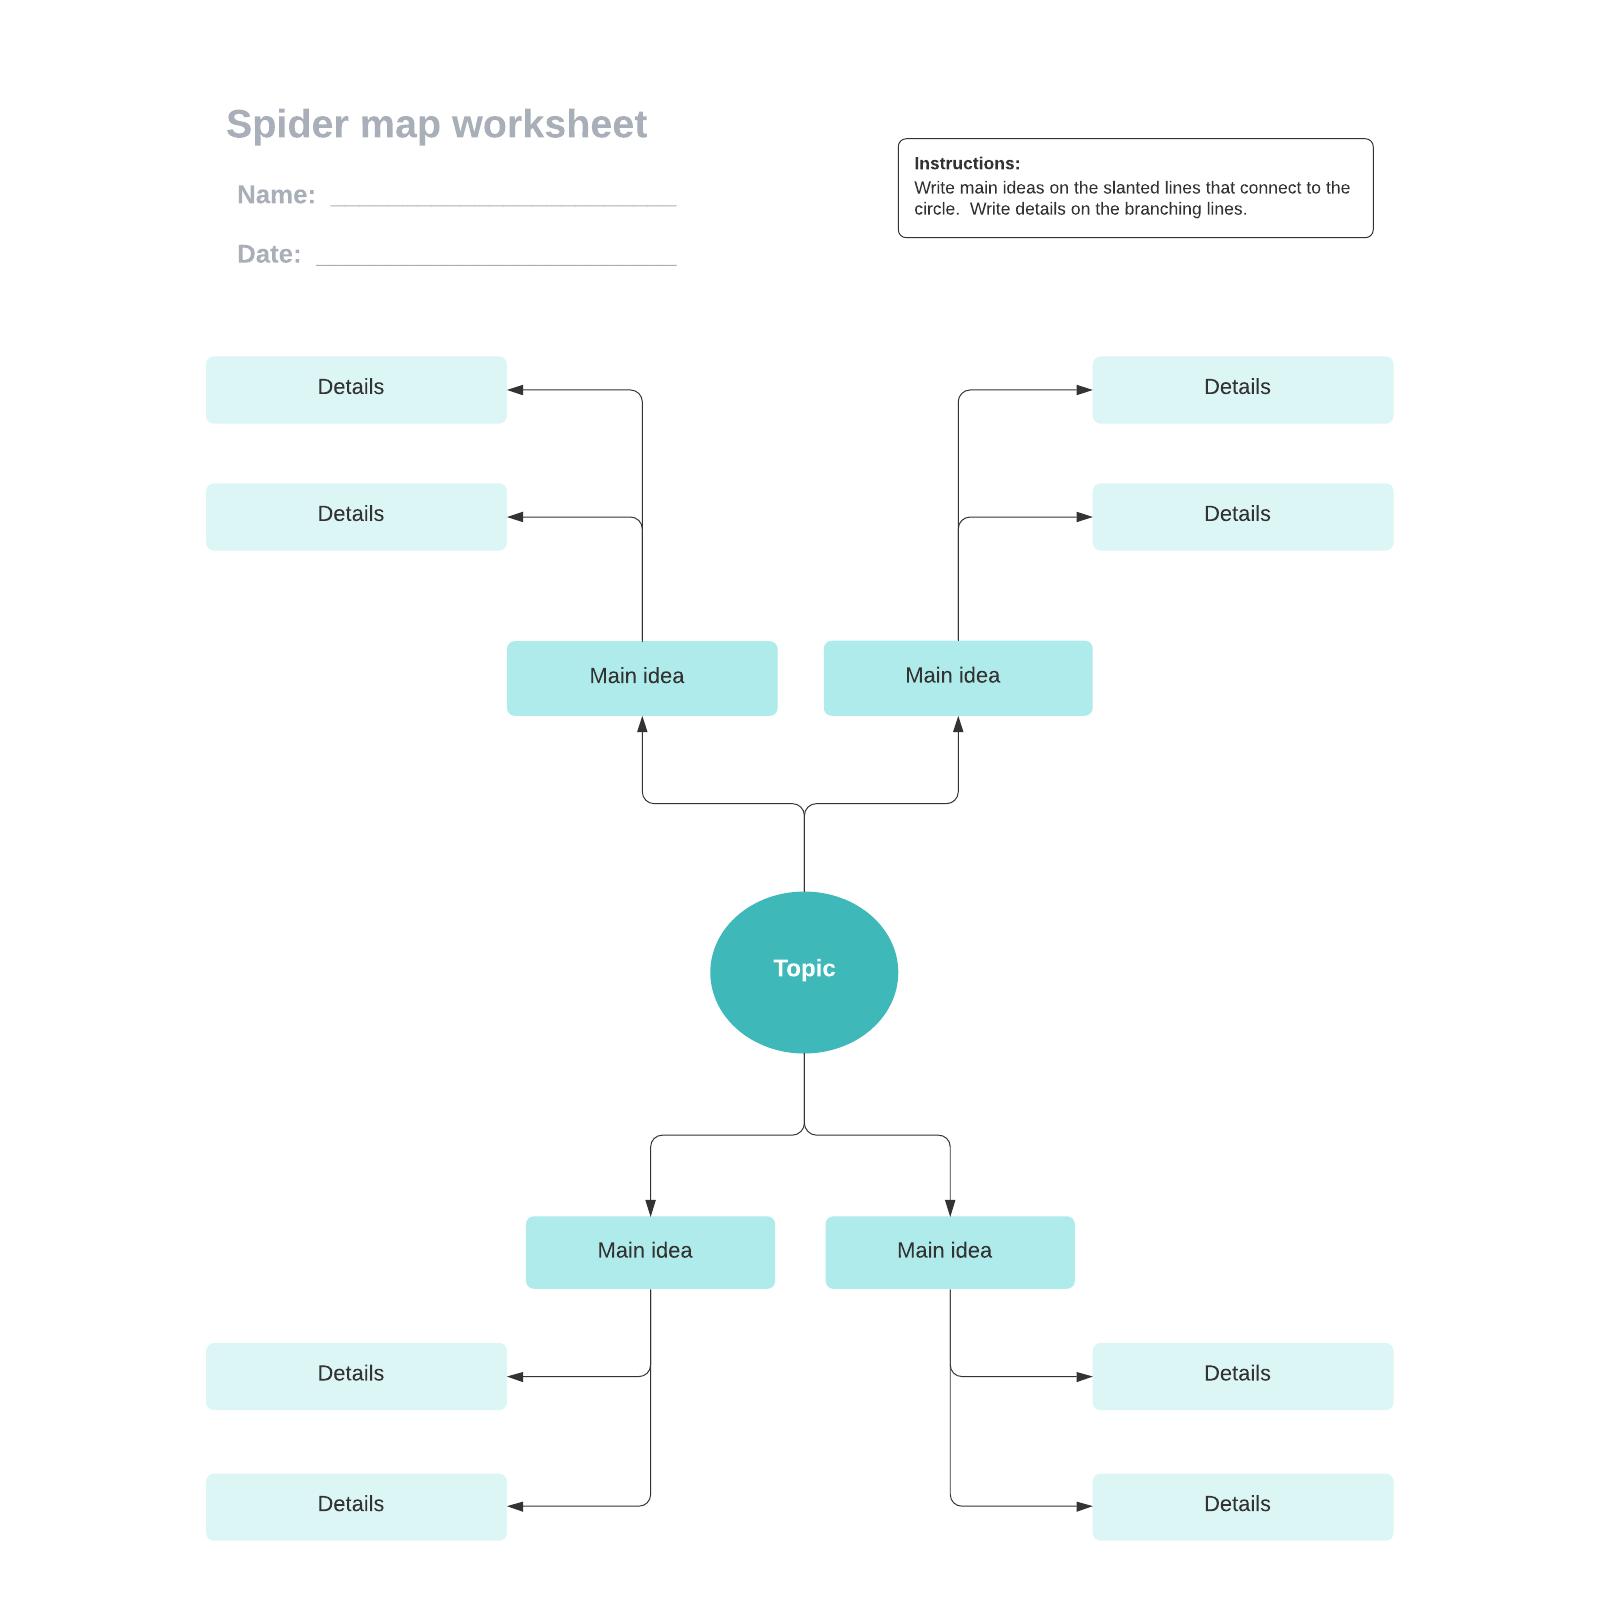 Spider map worksheet